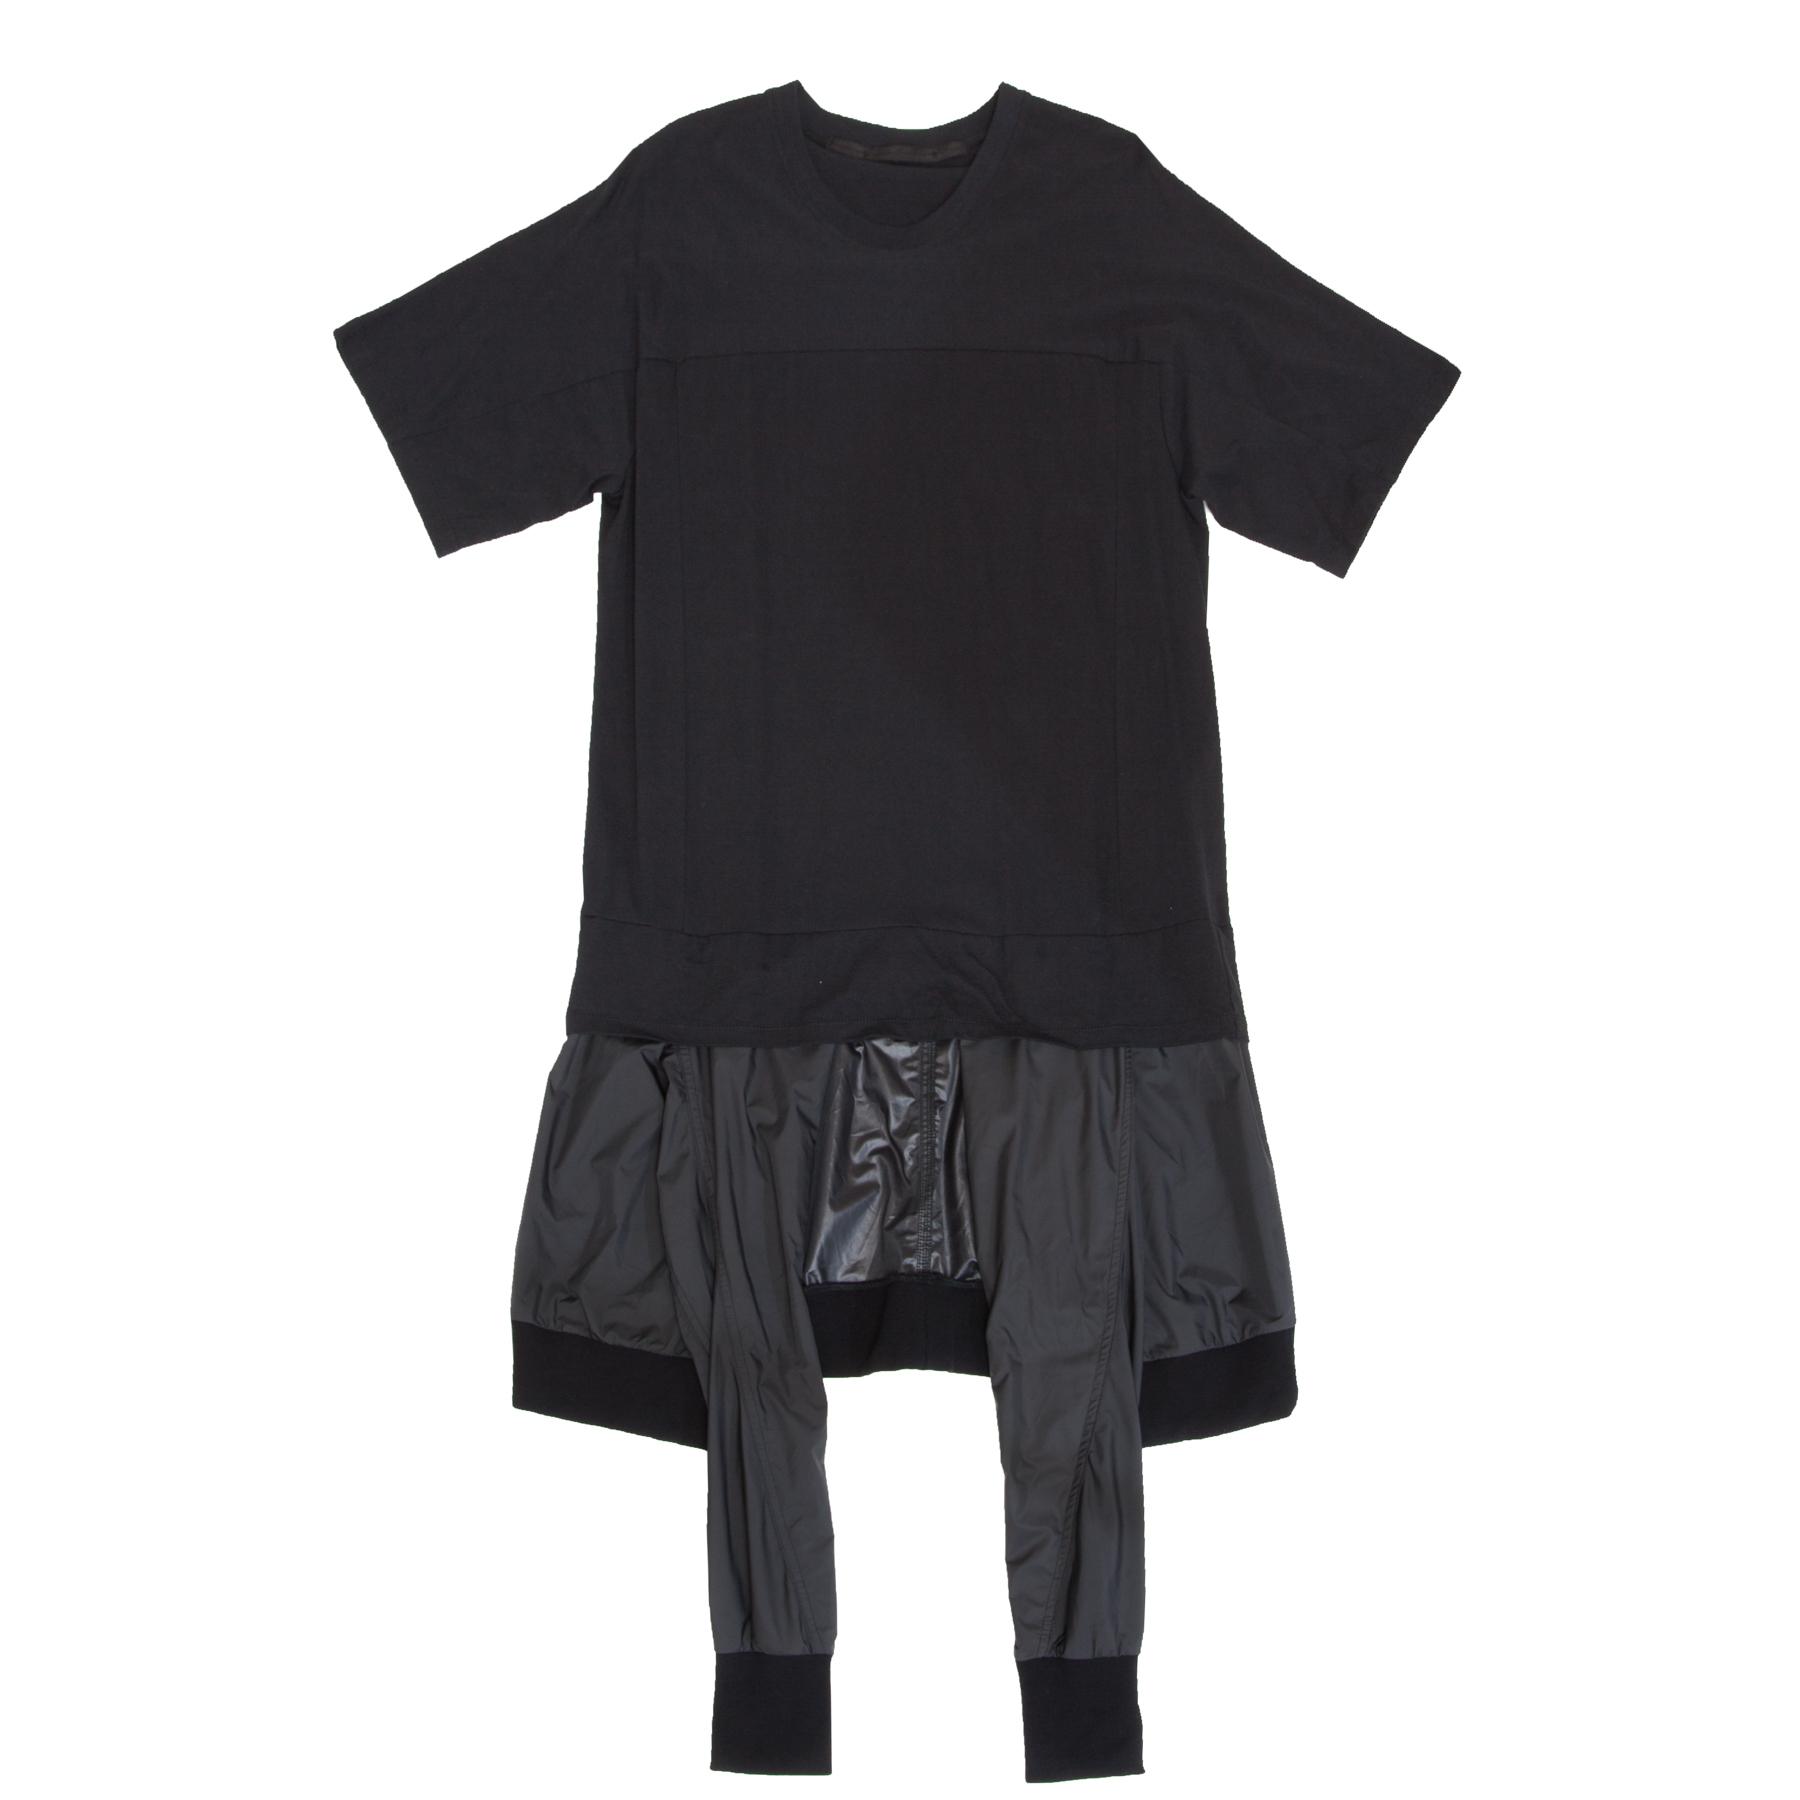 617CUM34-BLACK / レイヤードジャケットパーツT-シャツ